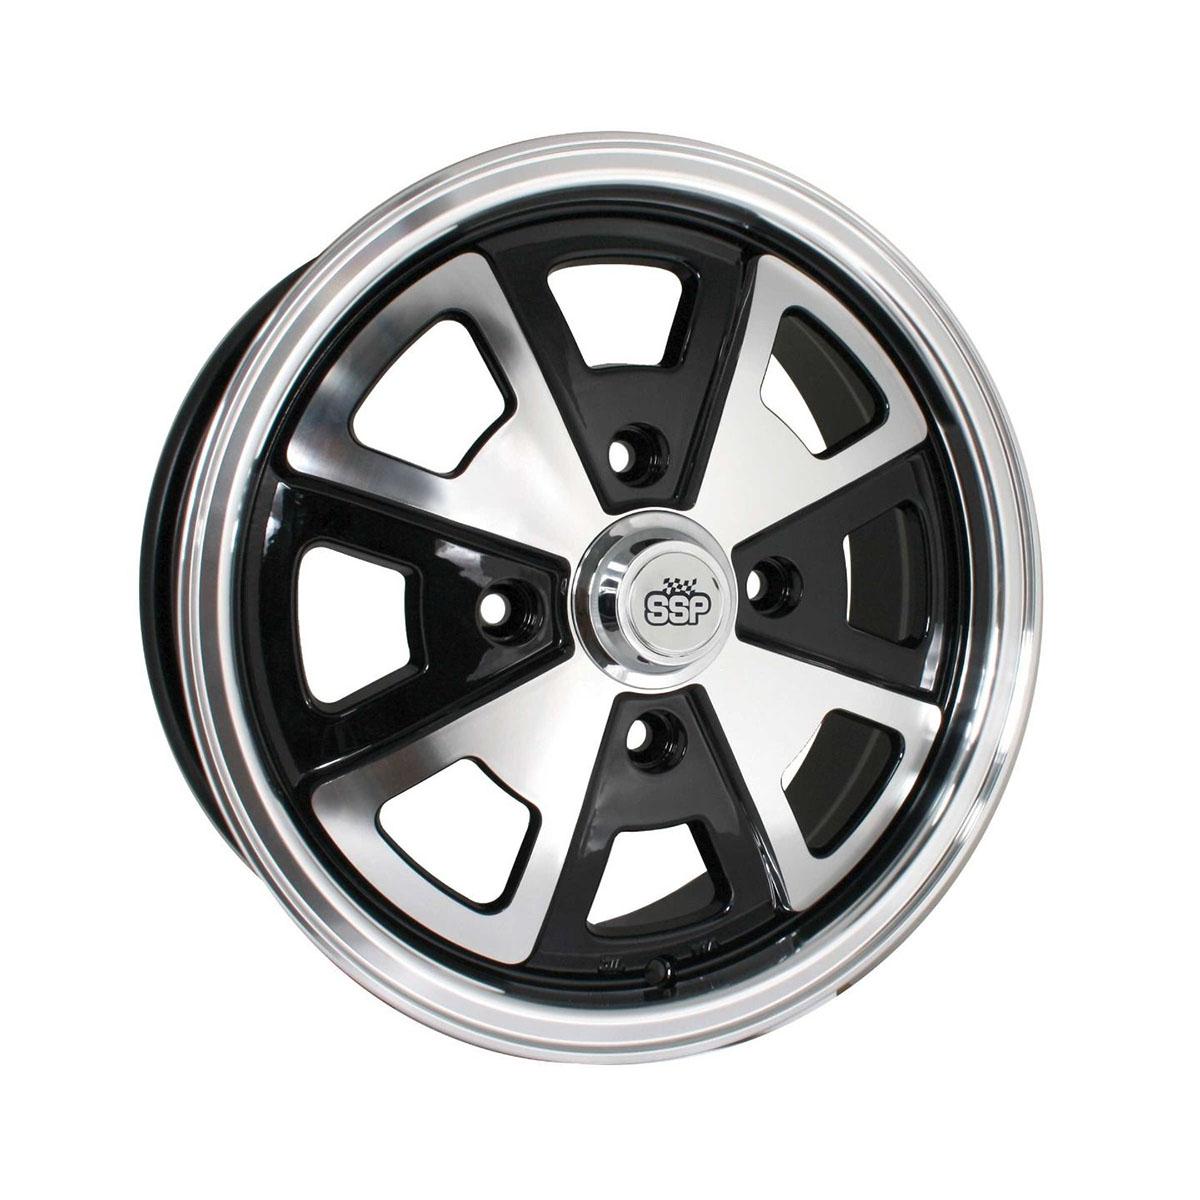 "Felga SSP 914 Style Alloy Wheel Black 5.5Jx15"" VW Garbus, Karmann Ghia"